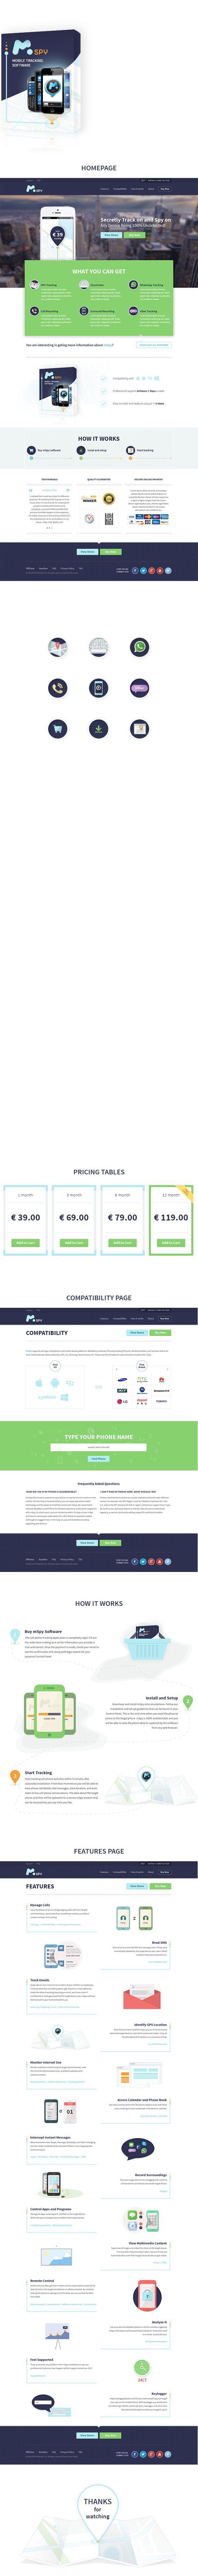 mSpy - flat corporate website by Olia Gozha, via Behance